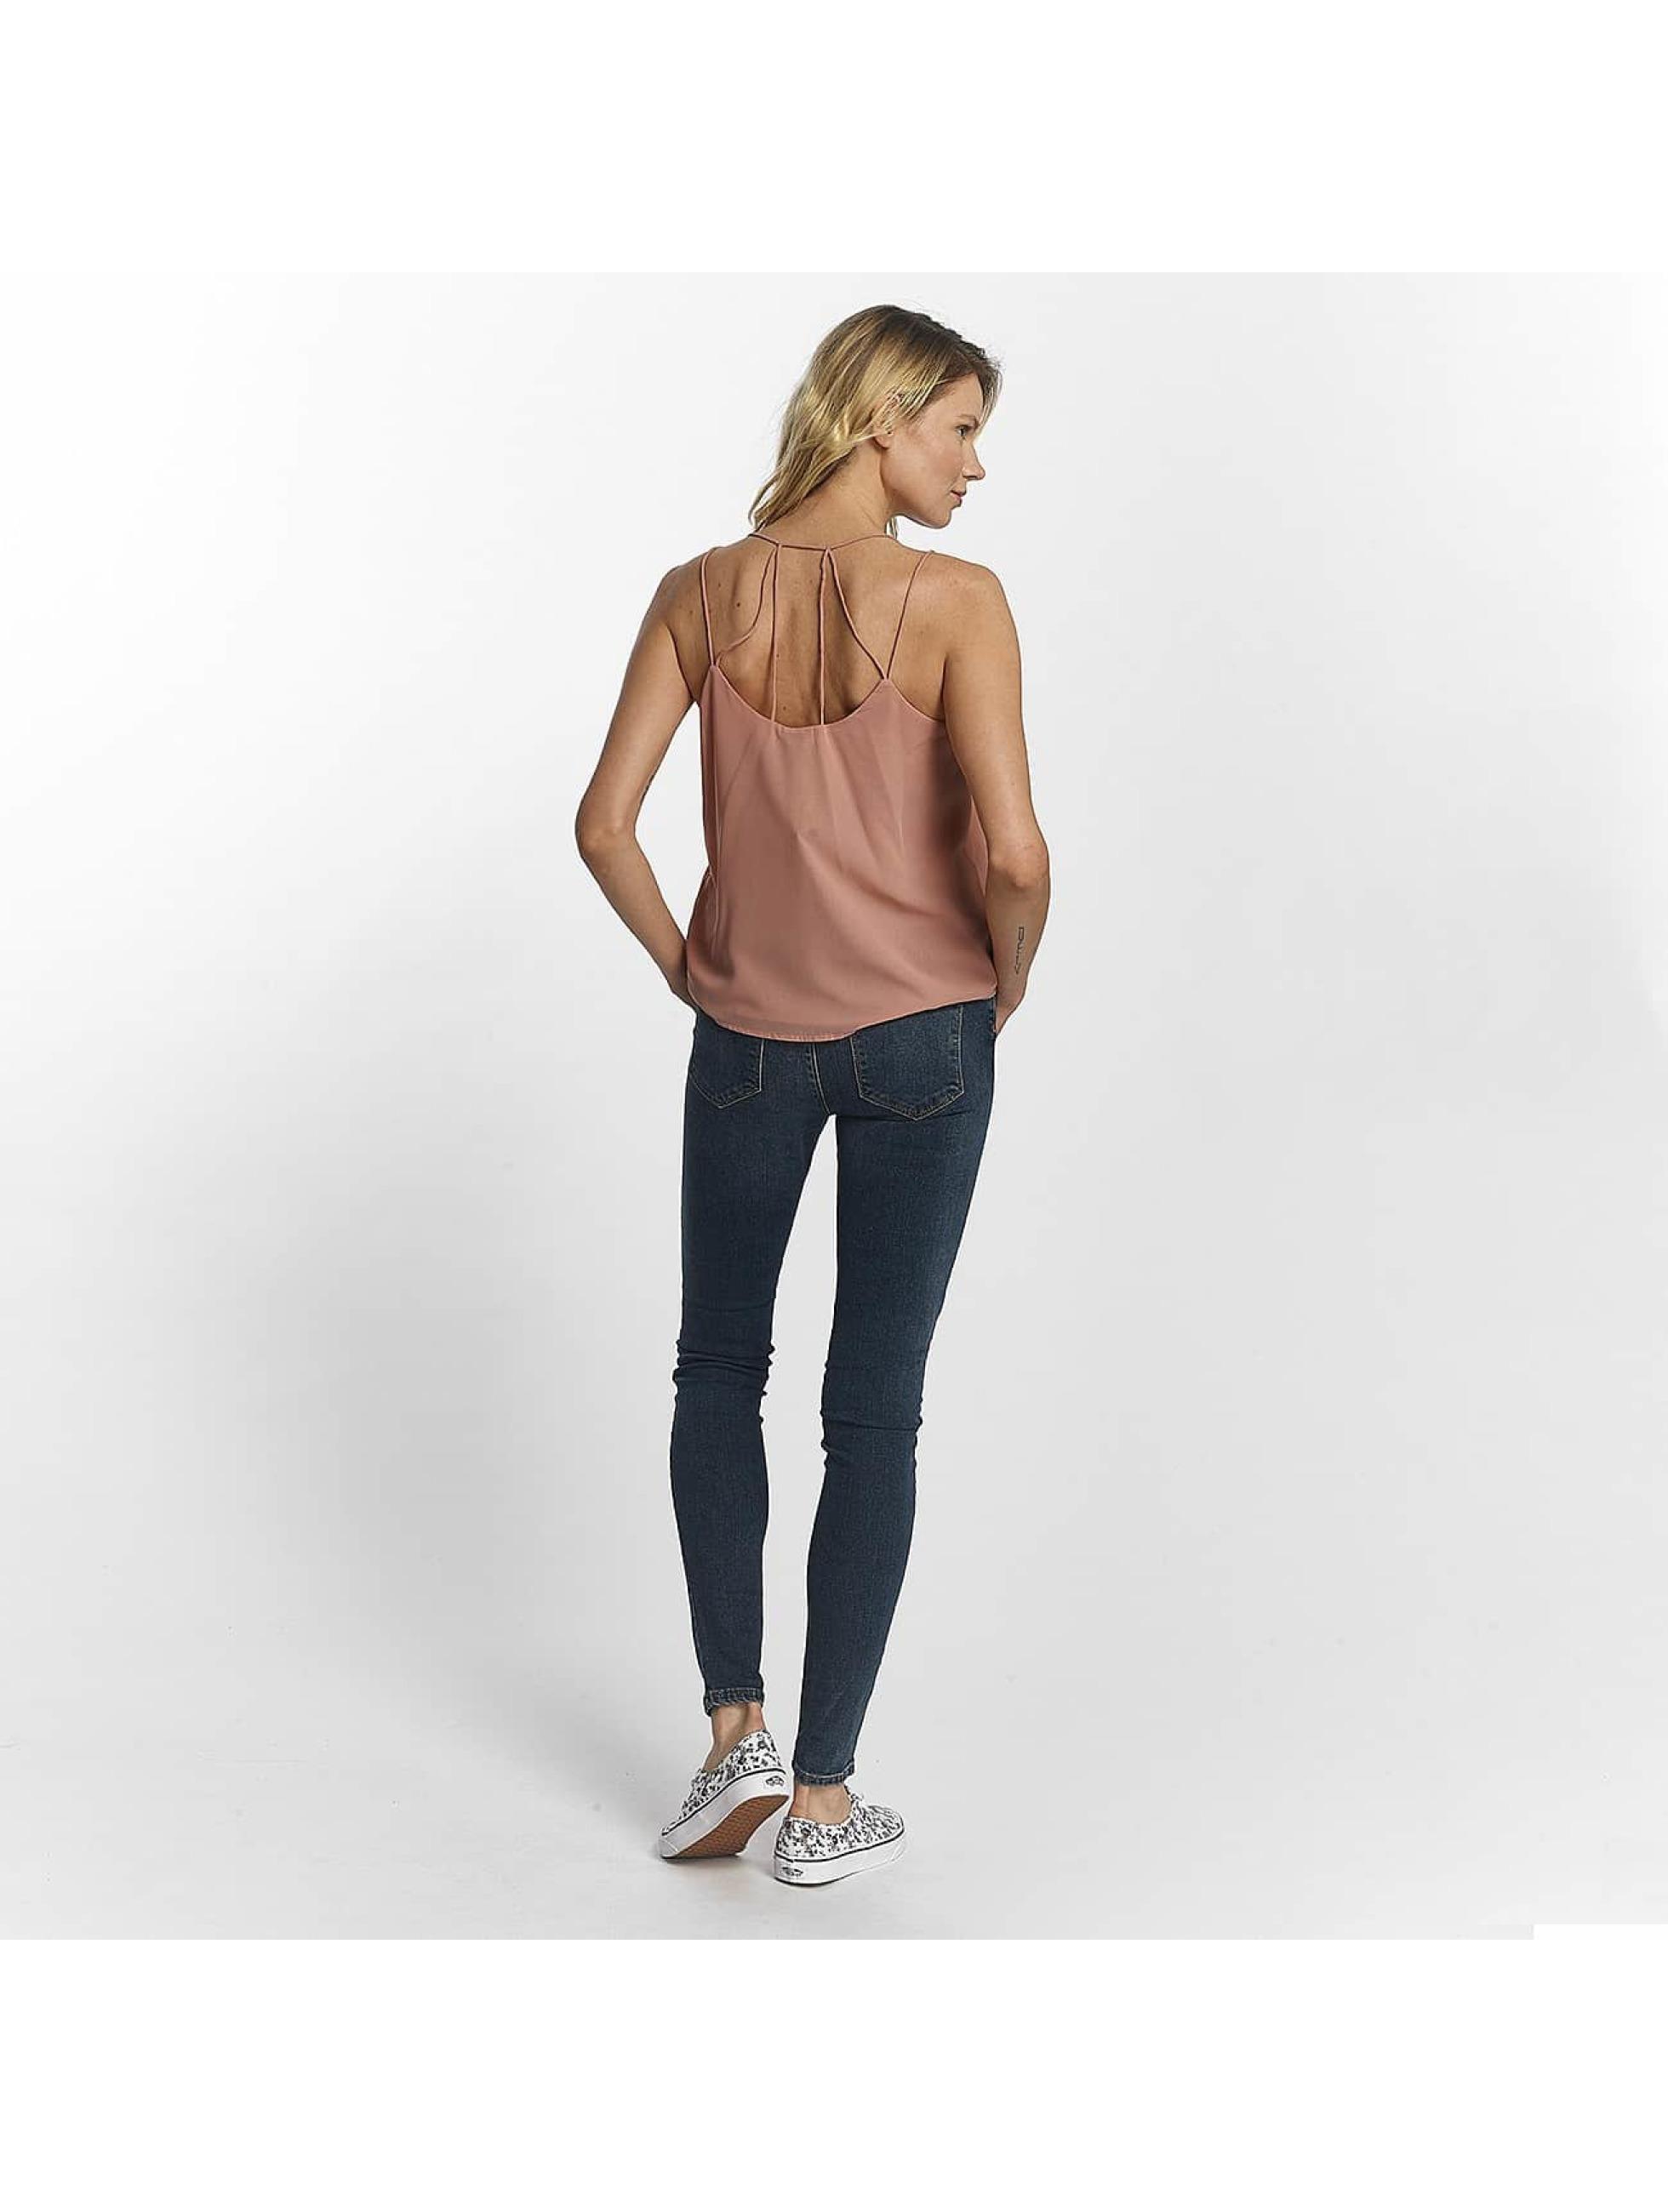 Vero Moda Top vmSexyback Singlet rose